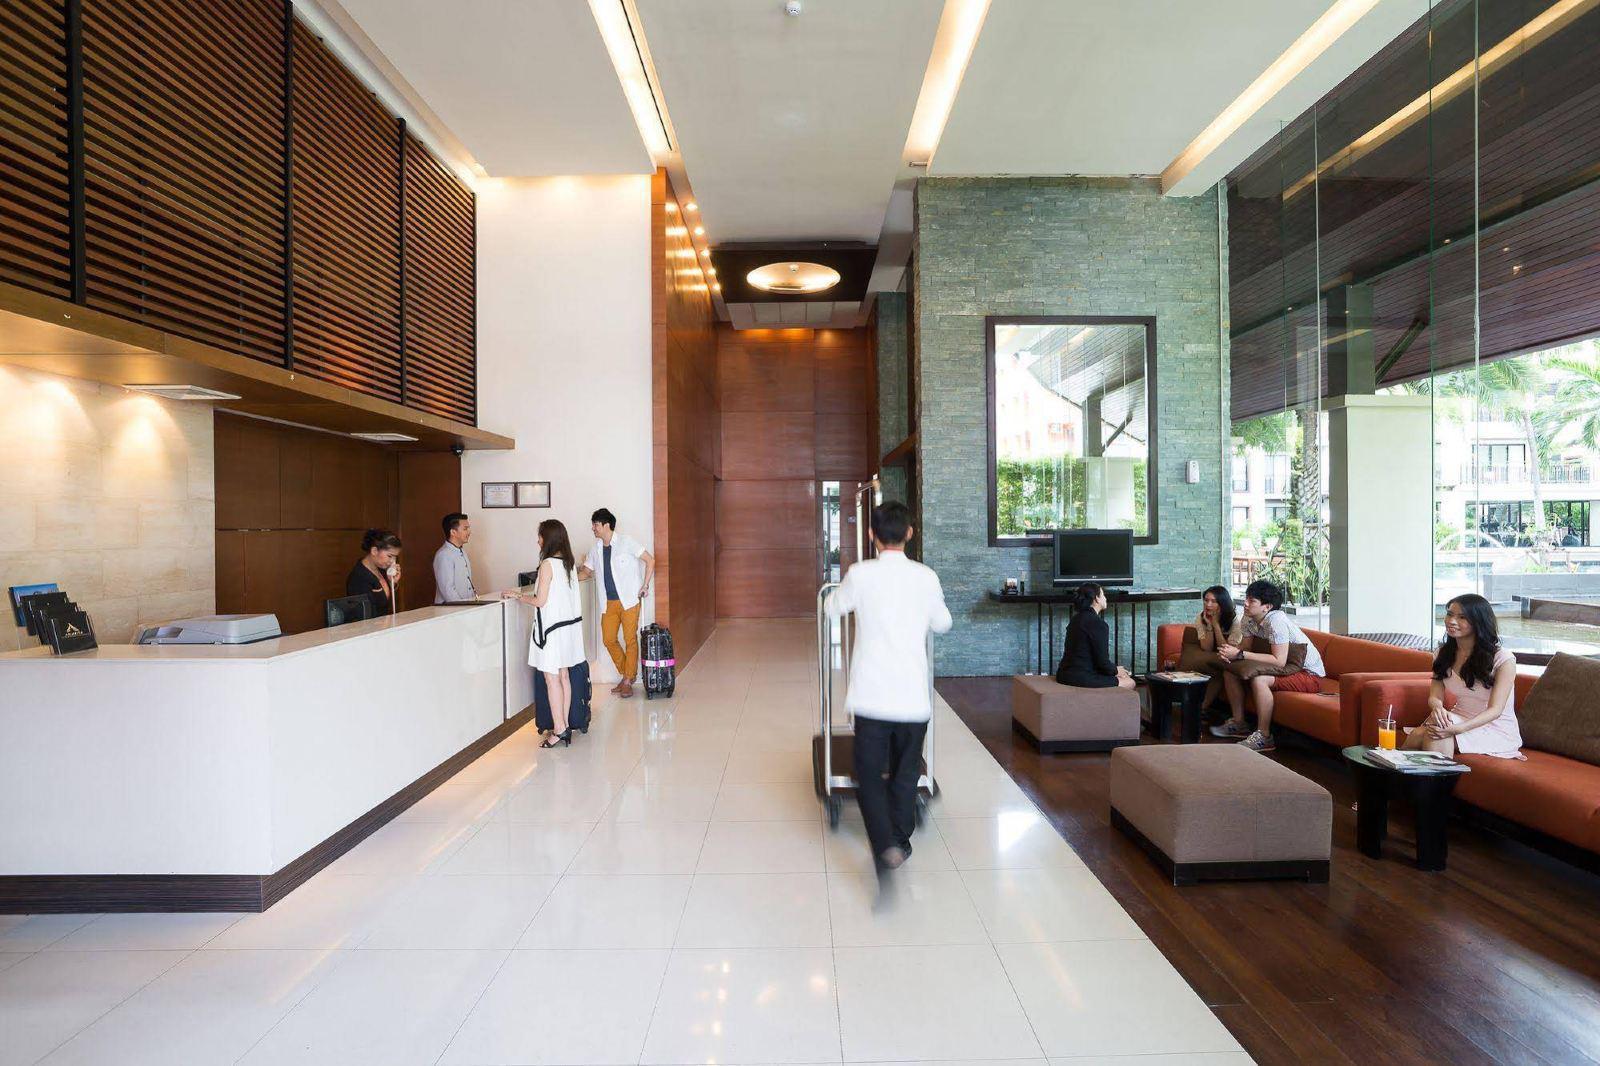 هتل امانتا اند رسیدنس راچادا بانکوک